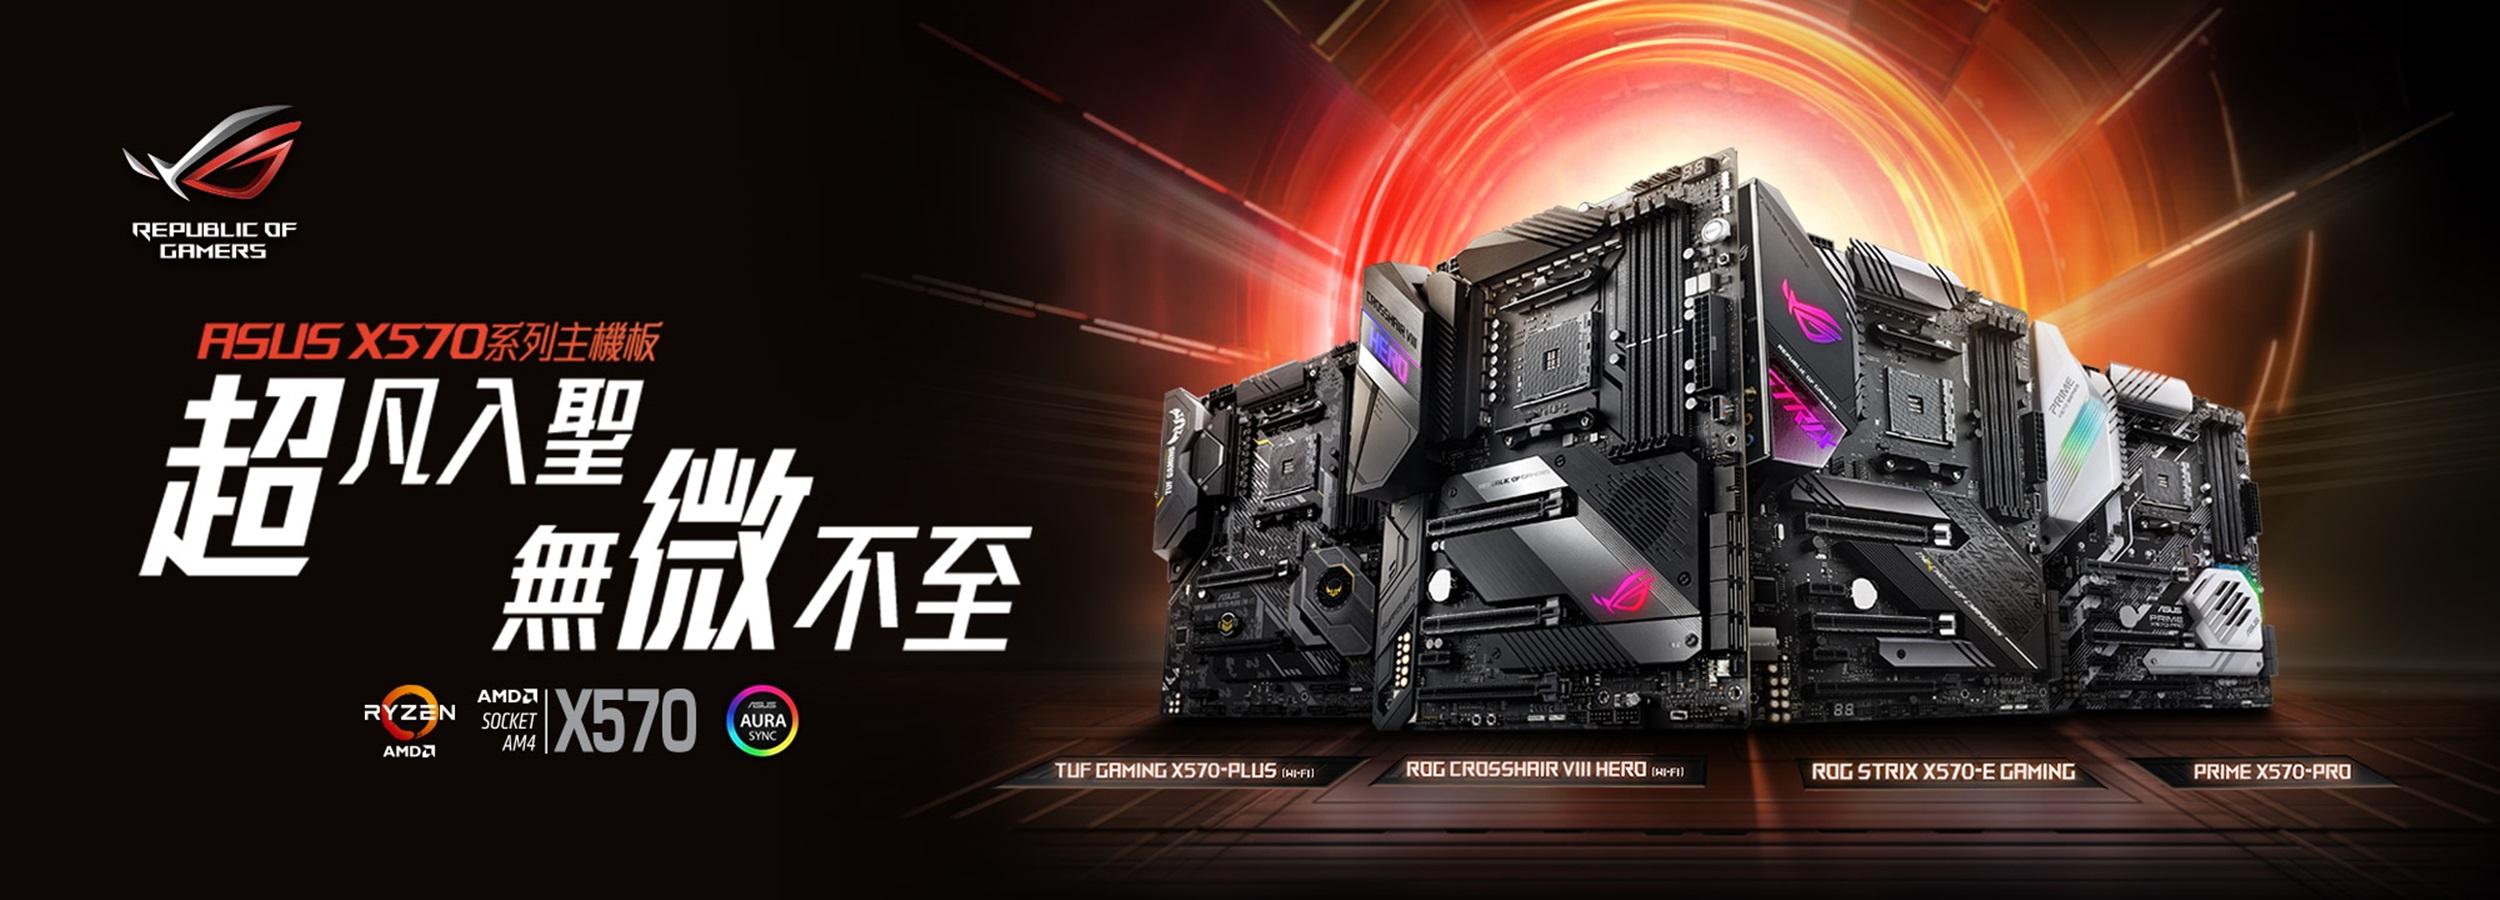 AMD X570系列主機板陣容堅強,從外型尺寸、功能到價格區間均一應俱全,提供玩家們隨心所欲任意選搭